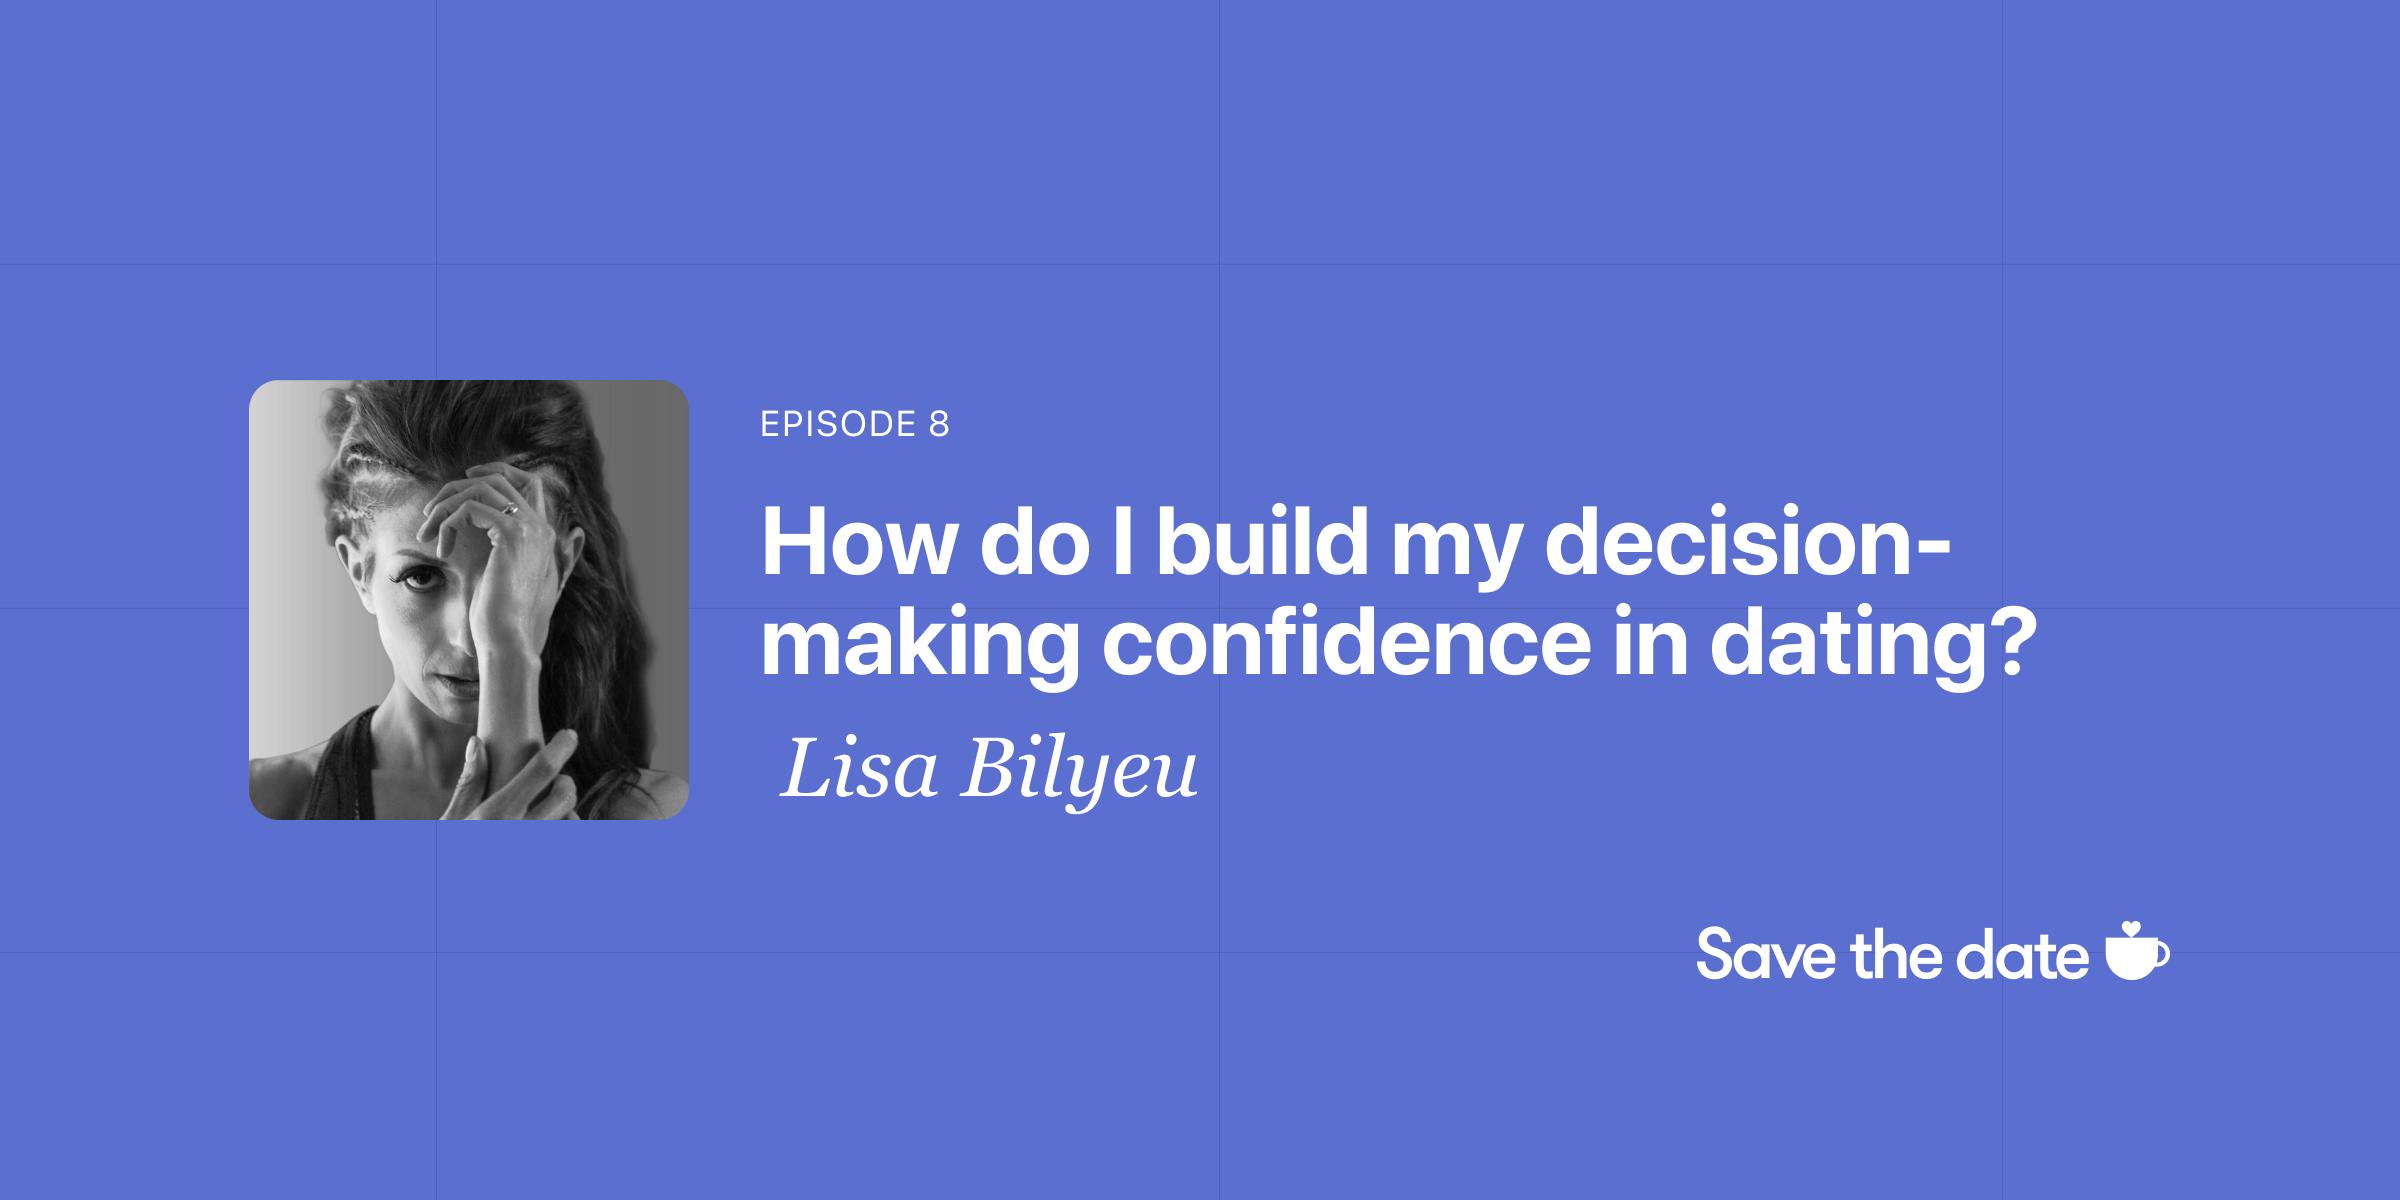 Lisa Bilyeu, Episode 8